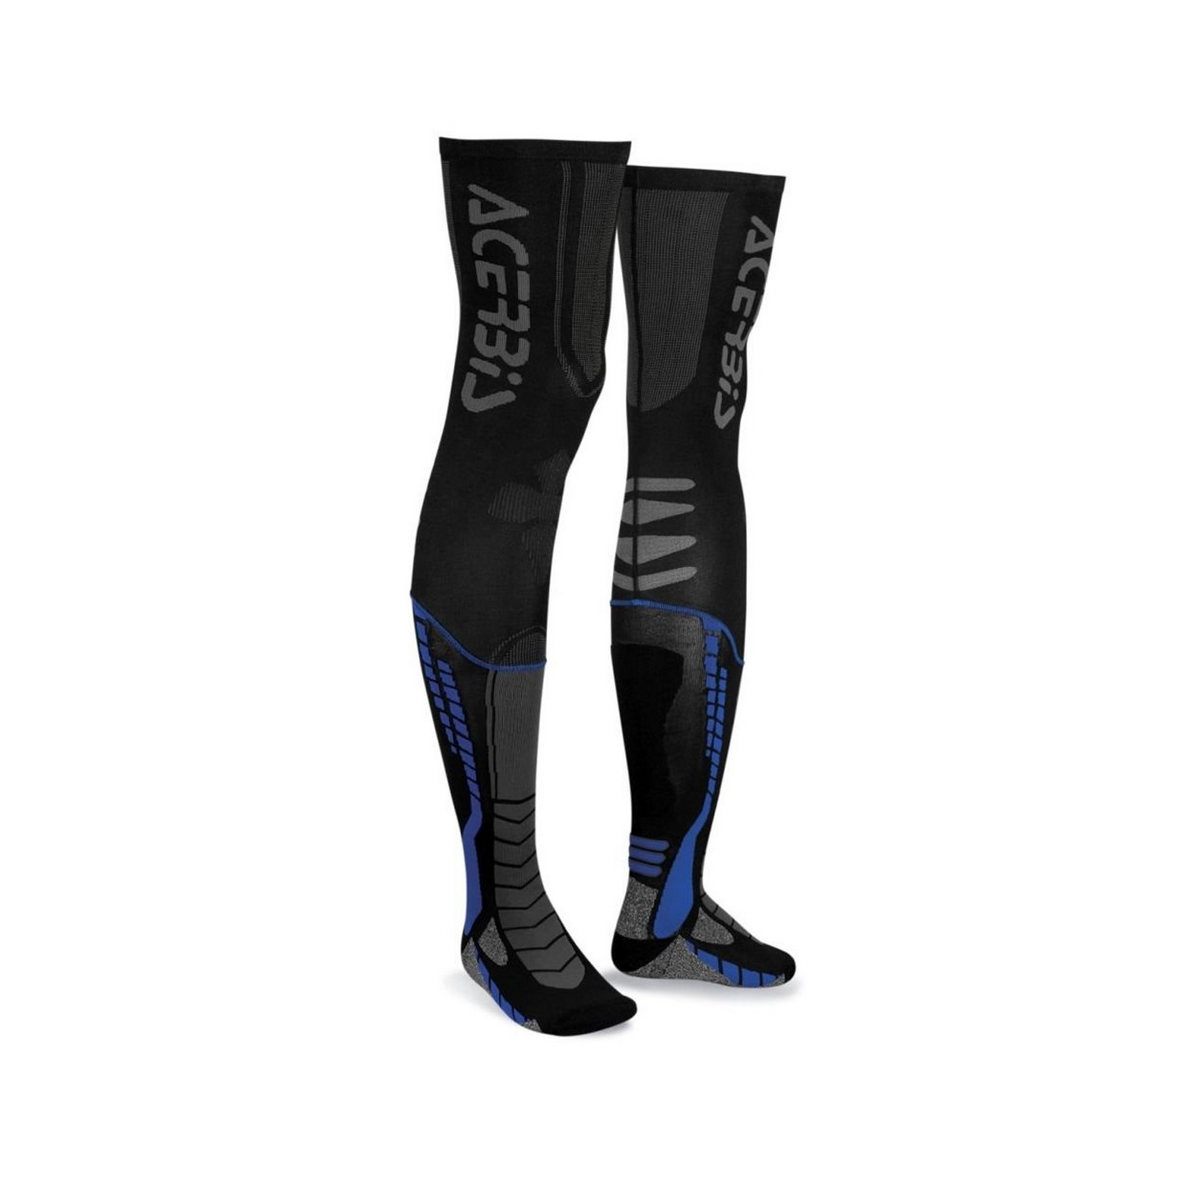 Motocross long socks X-LEG pro blue size L / XL